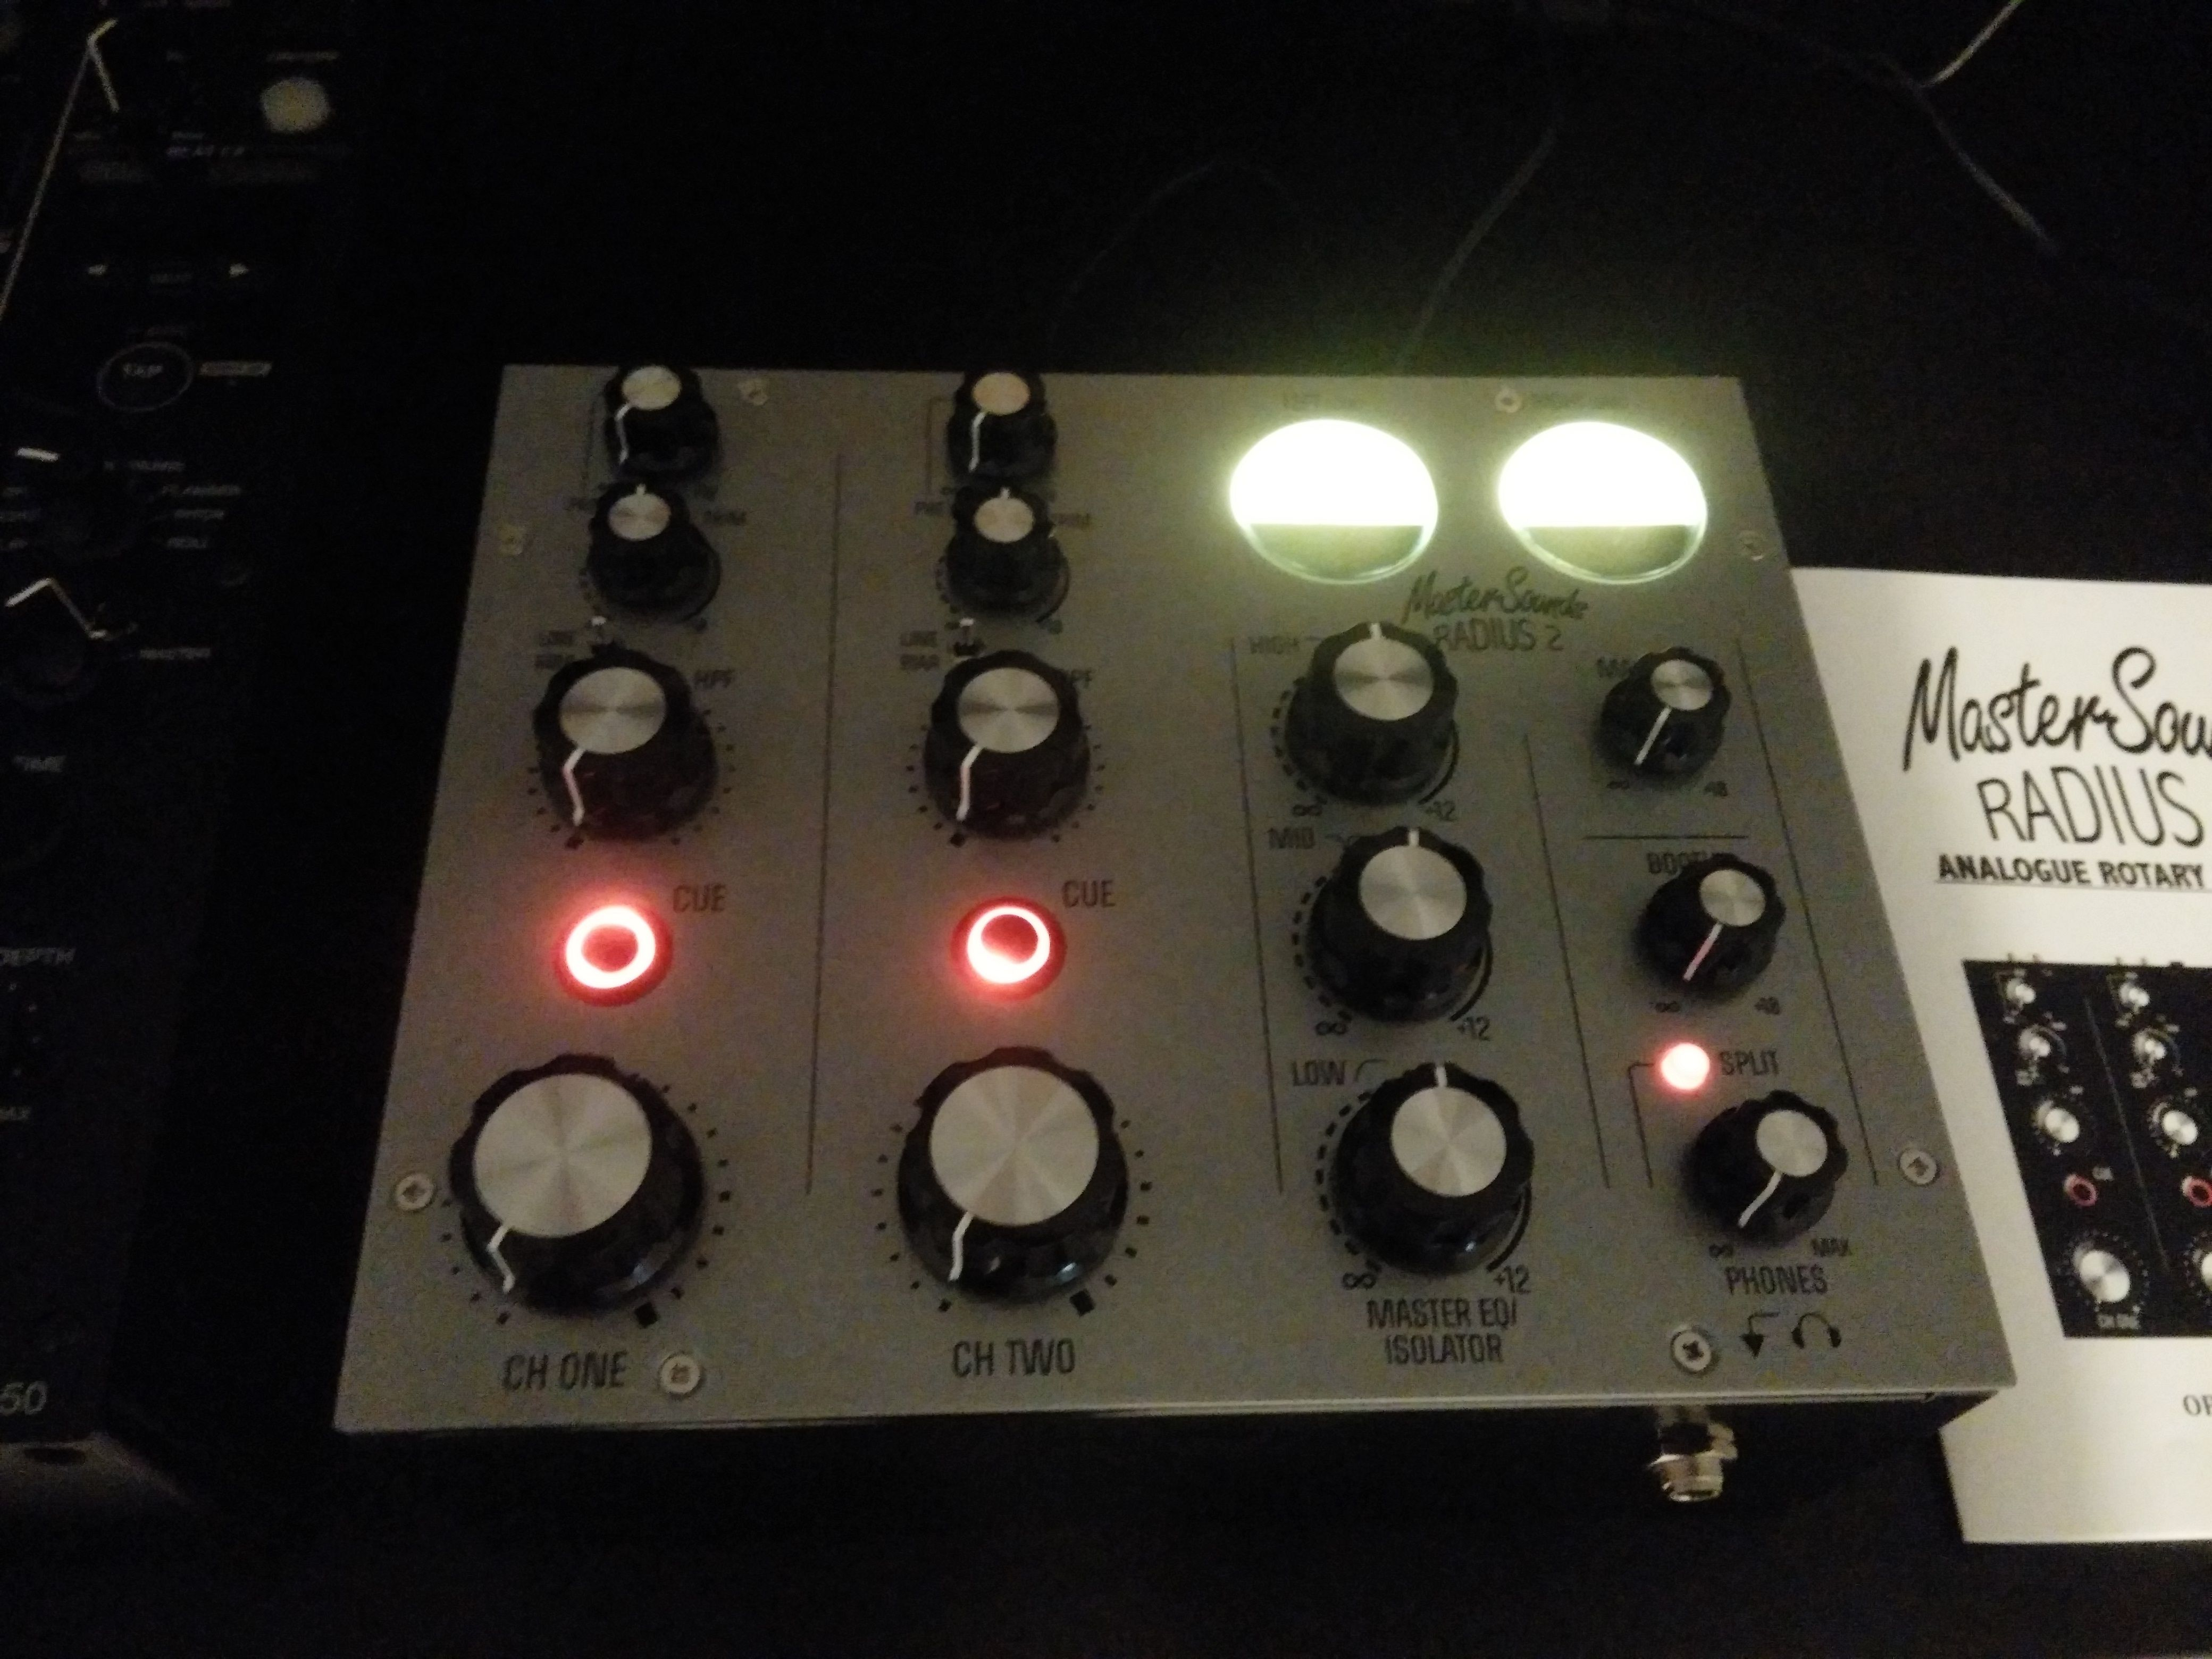 mastersounds radius 2 by union audio analogue rotary dj mixer audio audio mixer music. Black Bedroom Furniture Sets. Home Design Ideas